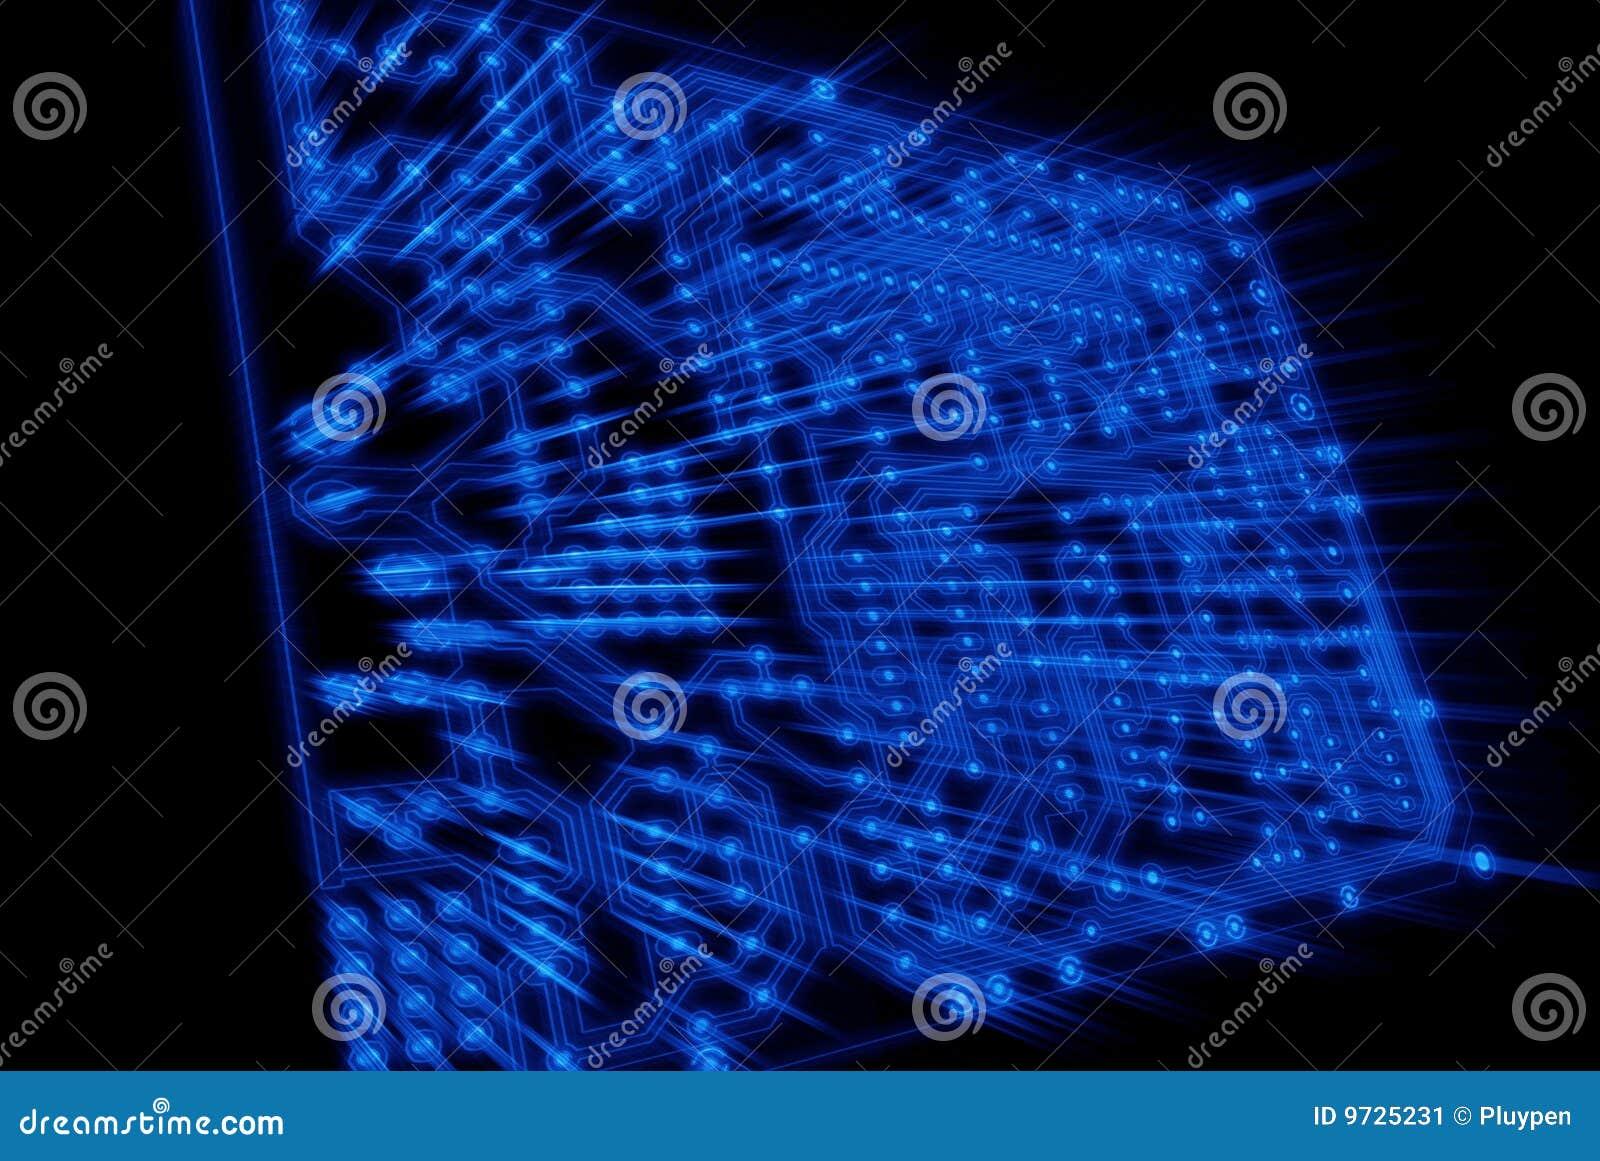 Misterio como pantalla de luz azul espiral cierne sobre Noruega ()